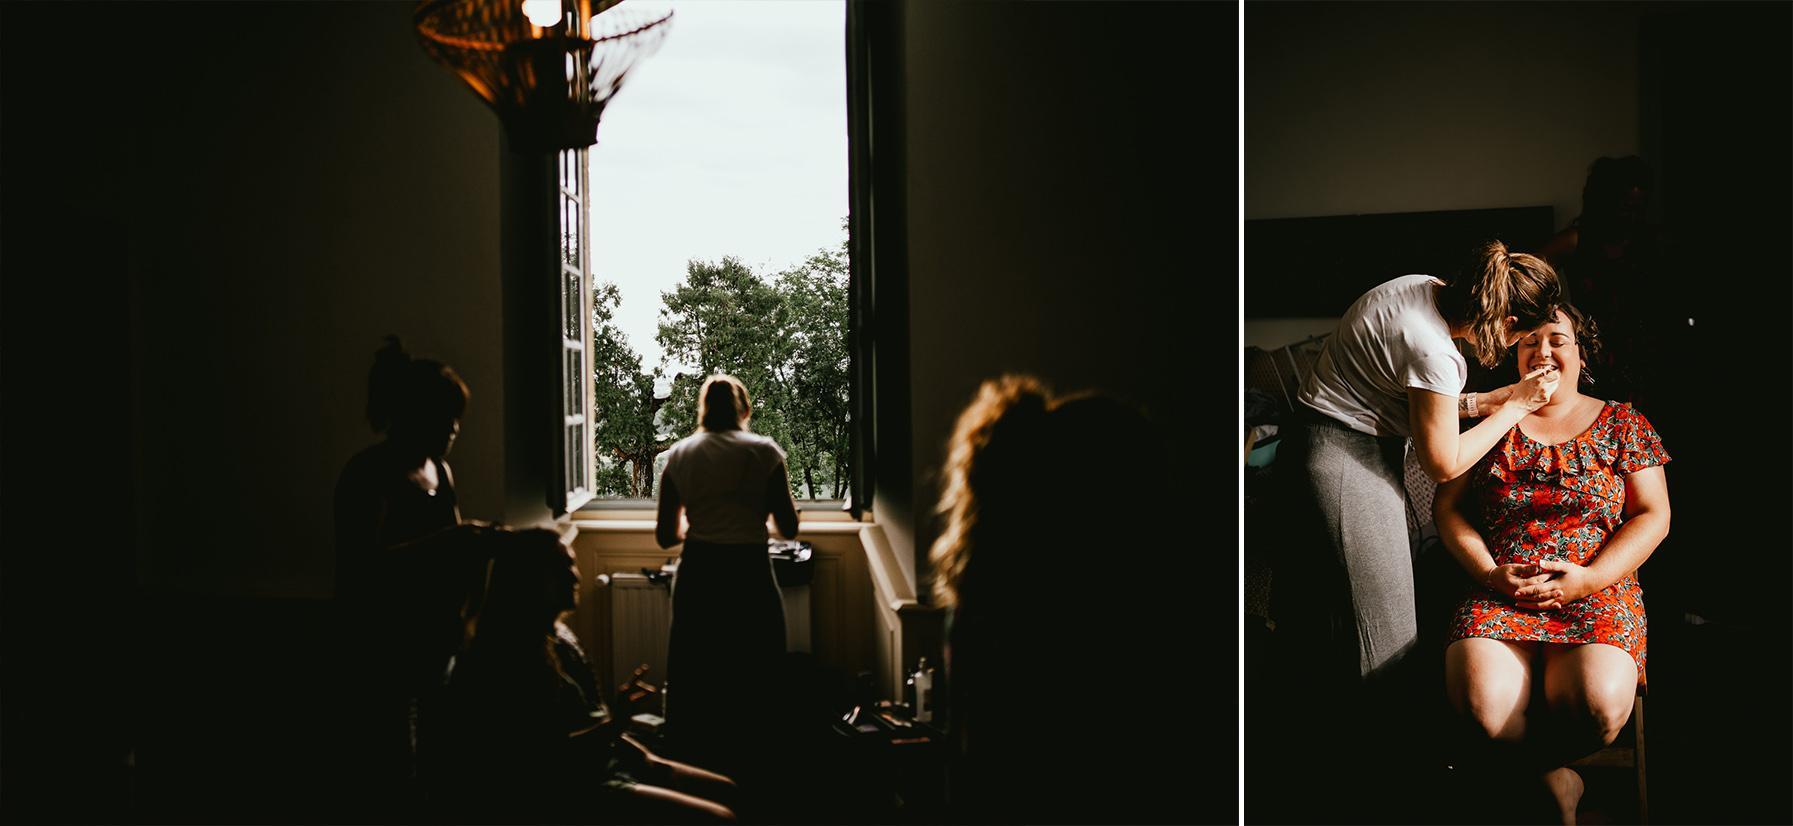 Photographe mariage landes preparatifs chateau